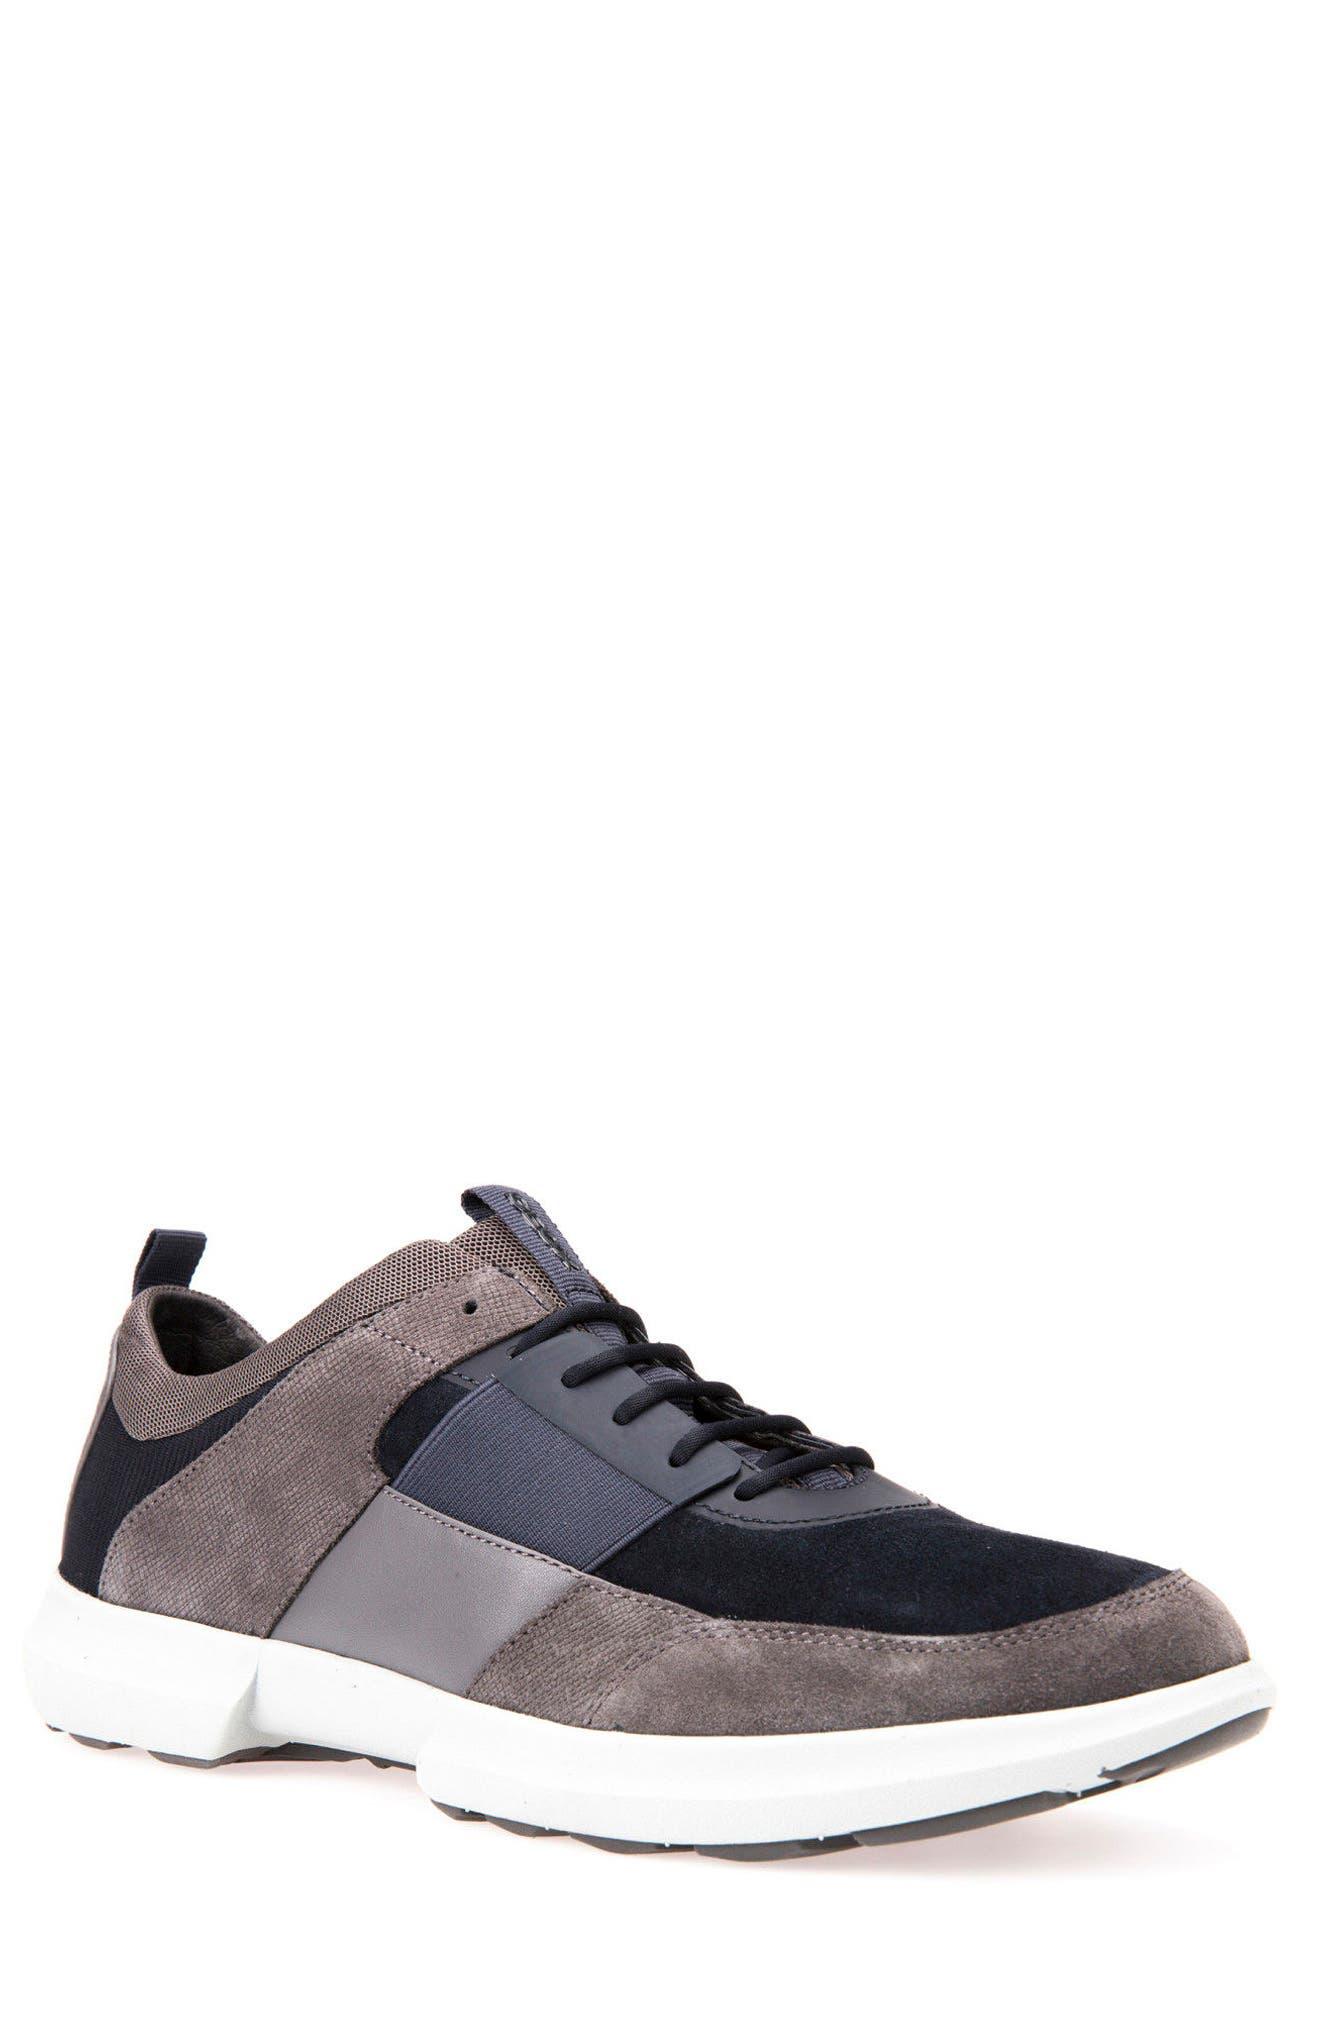 Traccia 5 Sneaker,                         Main,                         color, Navy/ Anthracite